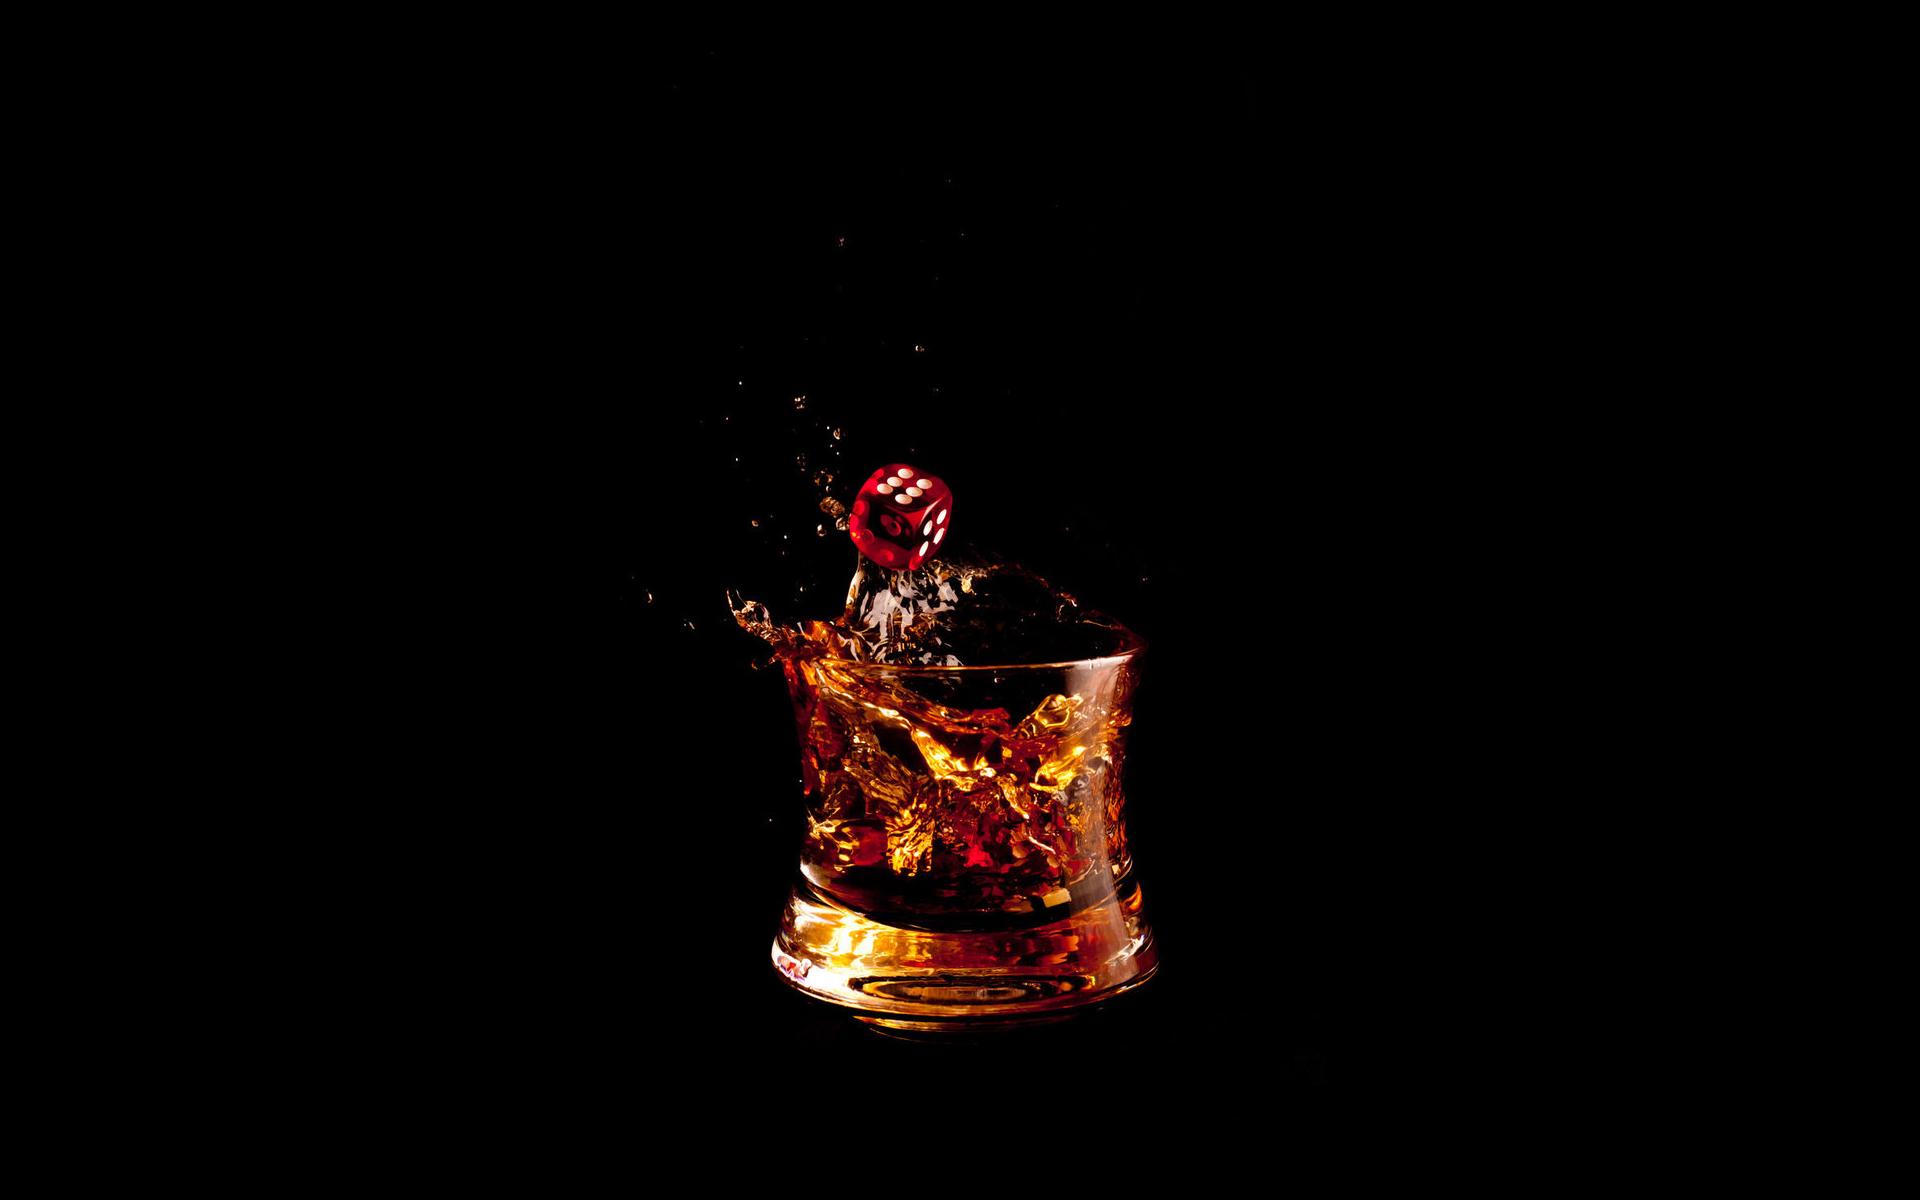 dice alcohol black splash wallpaper 1920x1200 64366